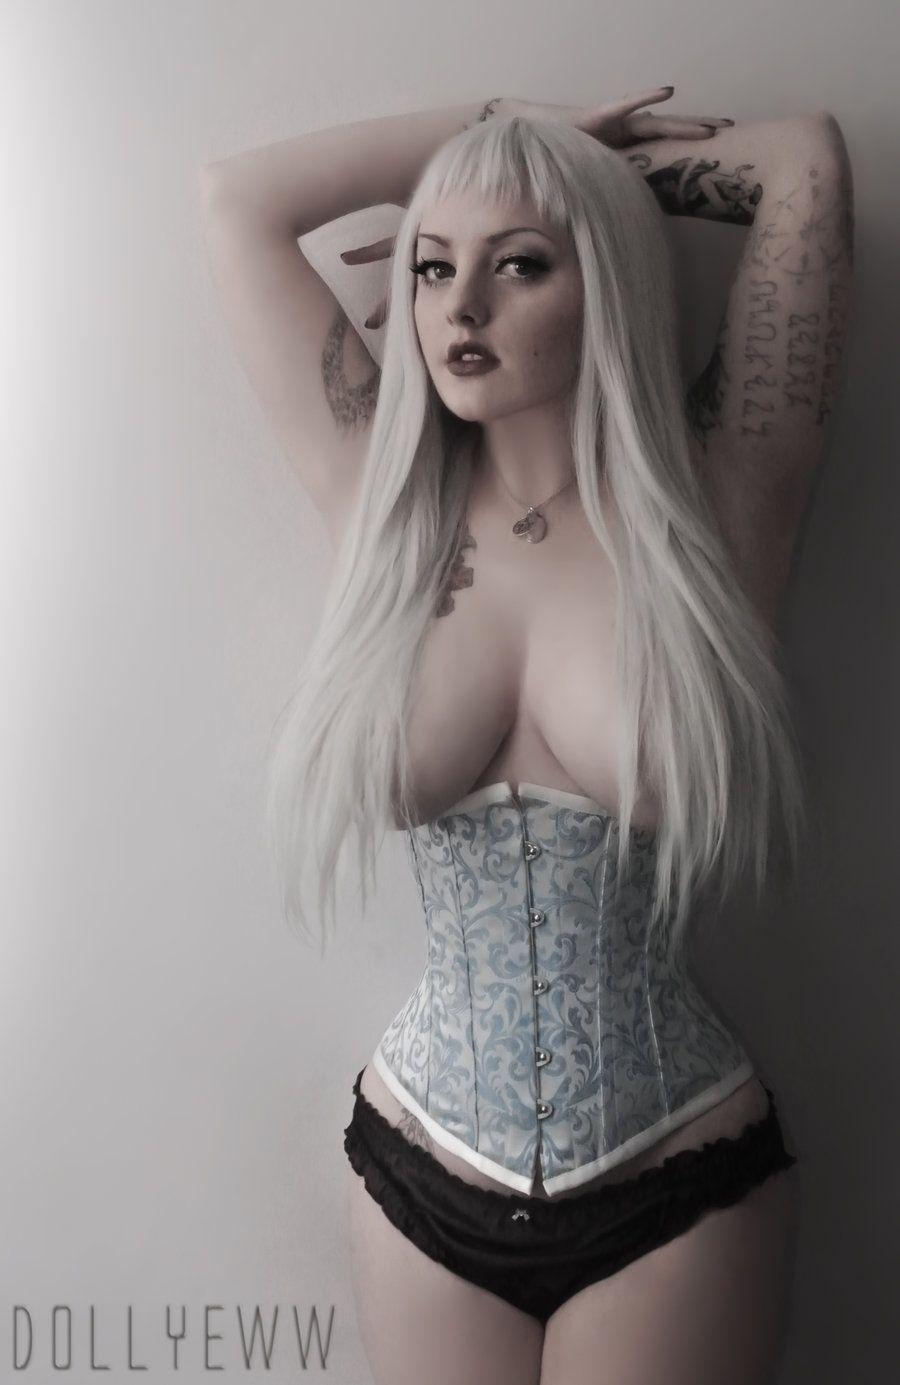 Nude Goth Girl Pics Minimalist tightlacingdollyeww.deviantart   goth   pinterest